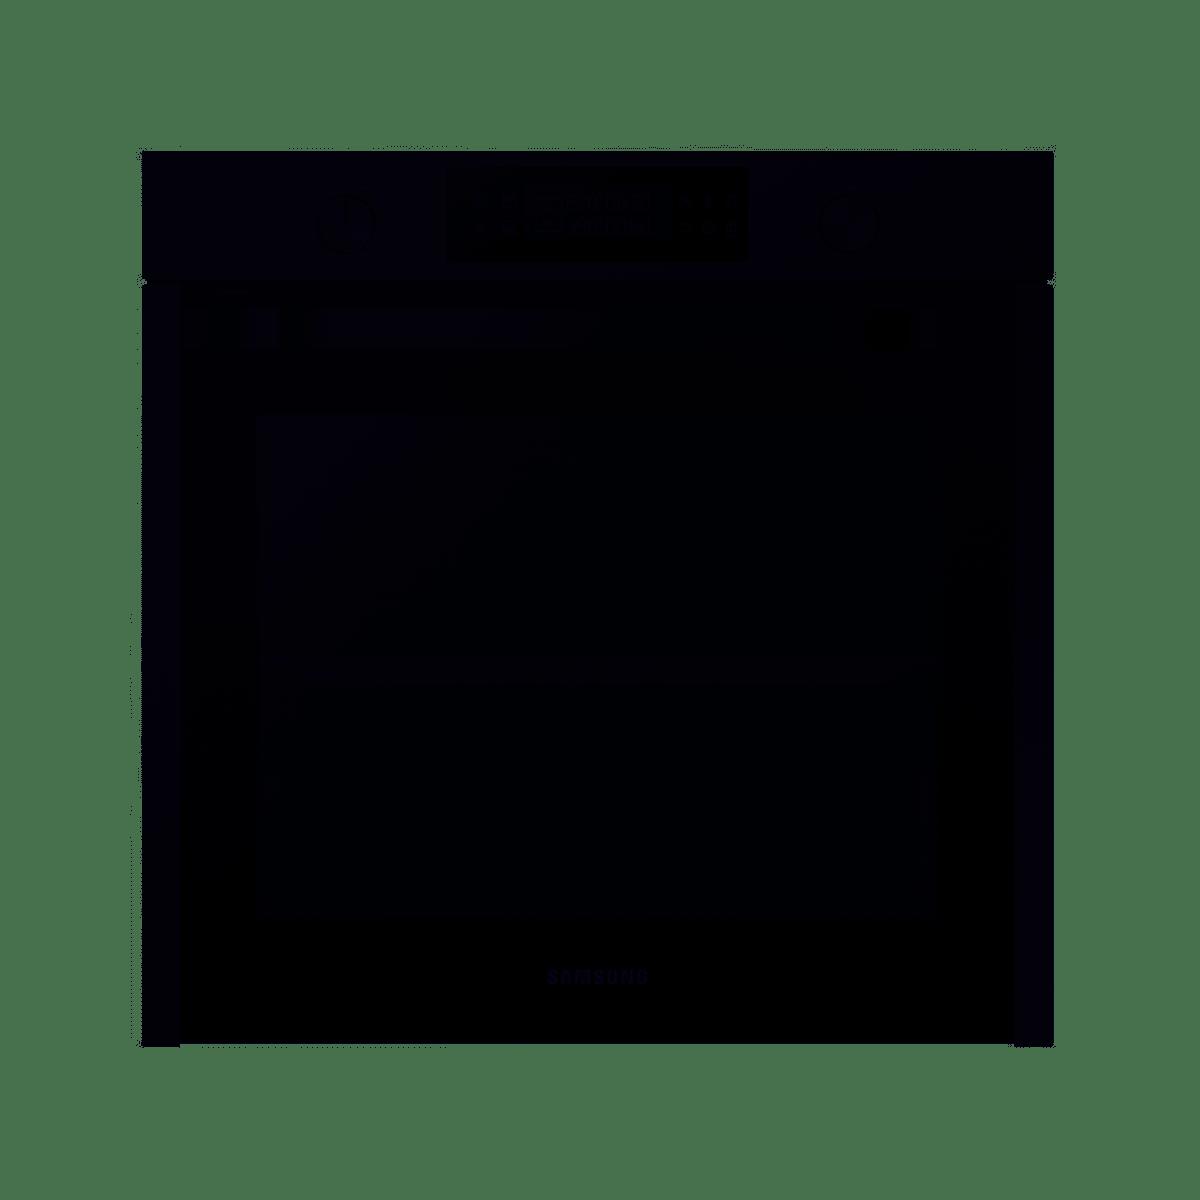 NV75N5573RM